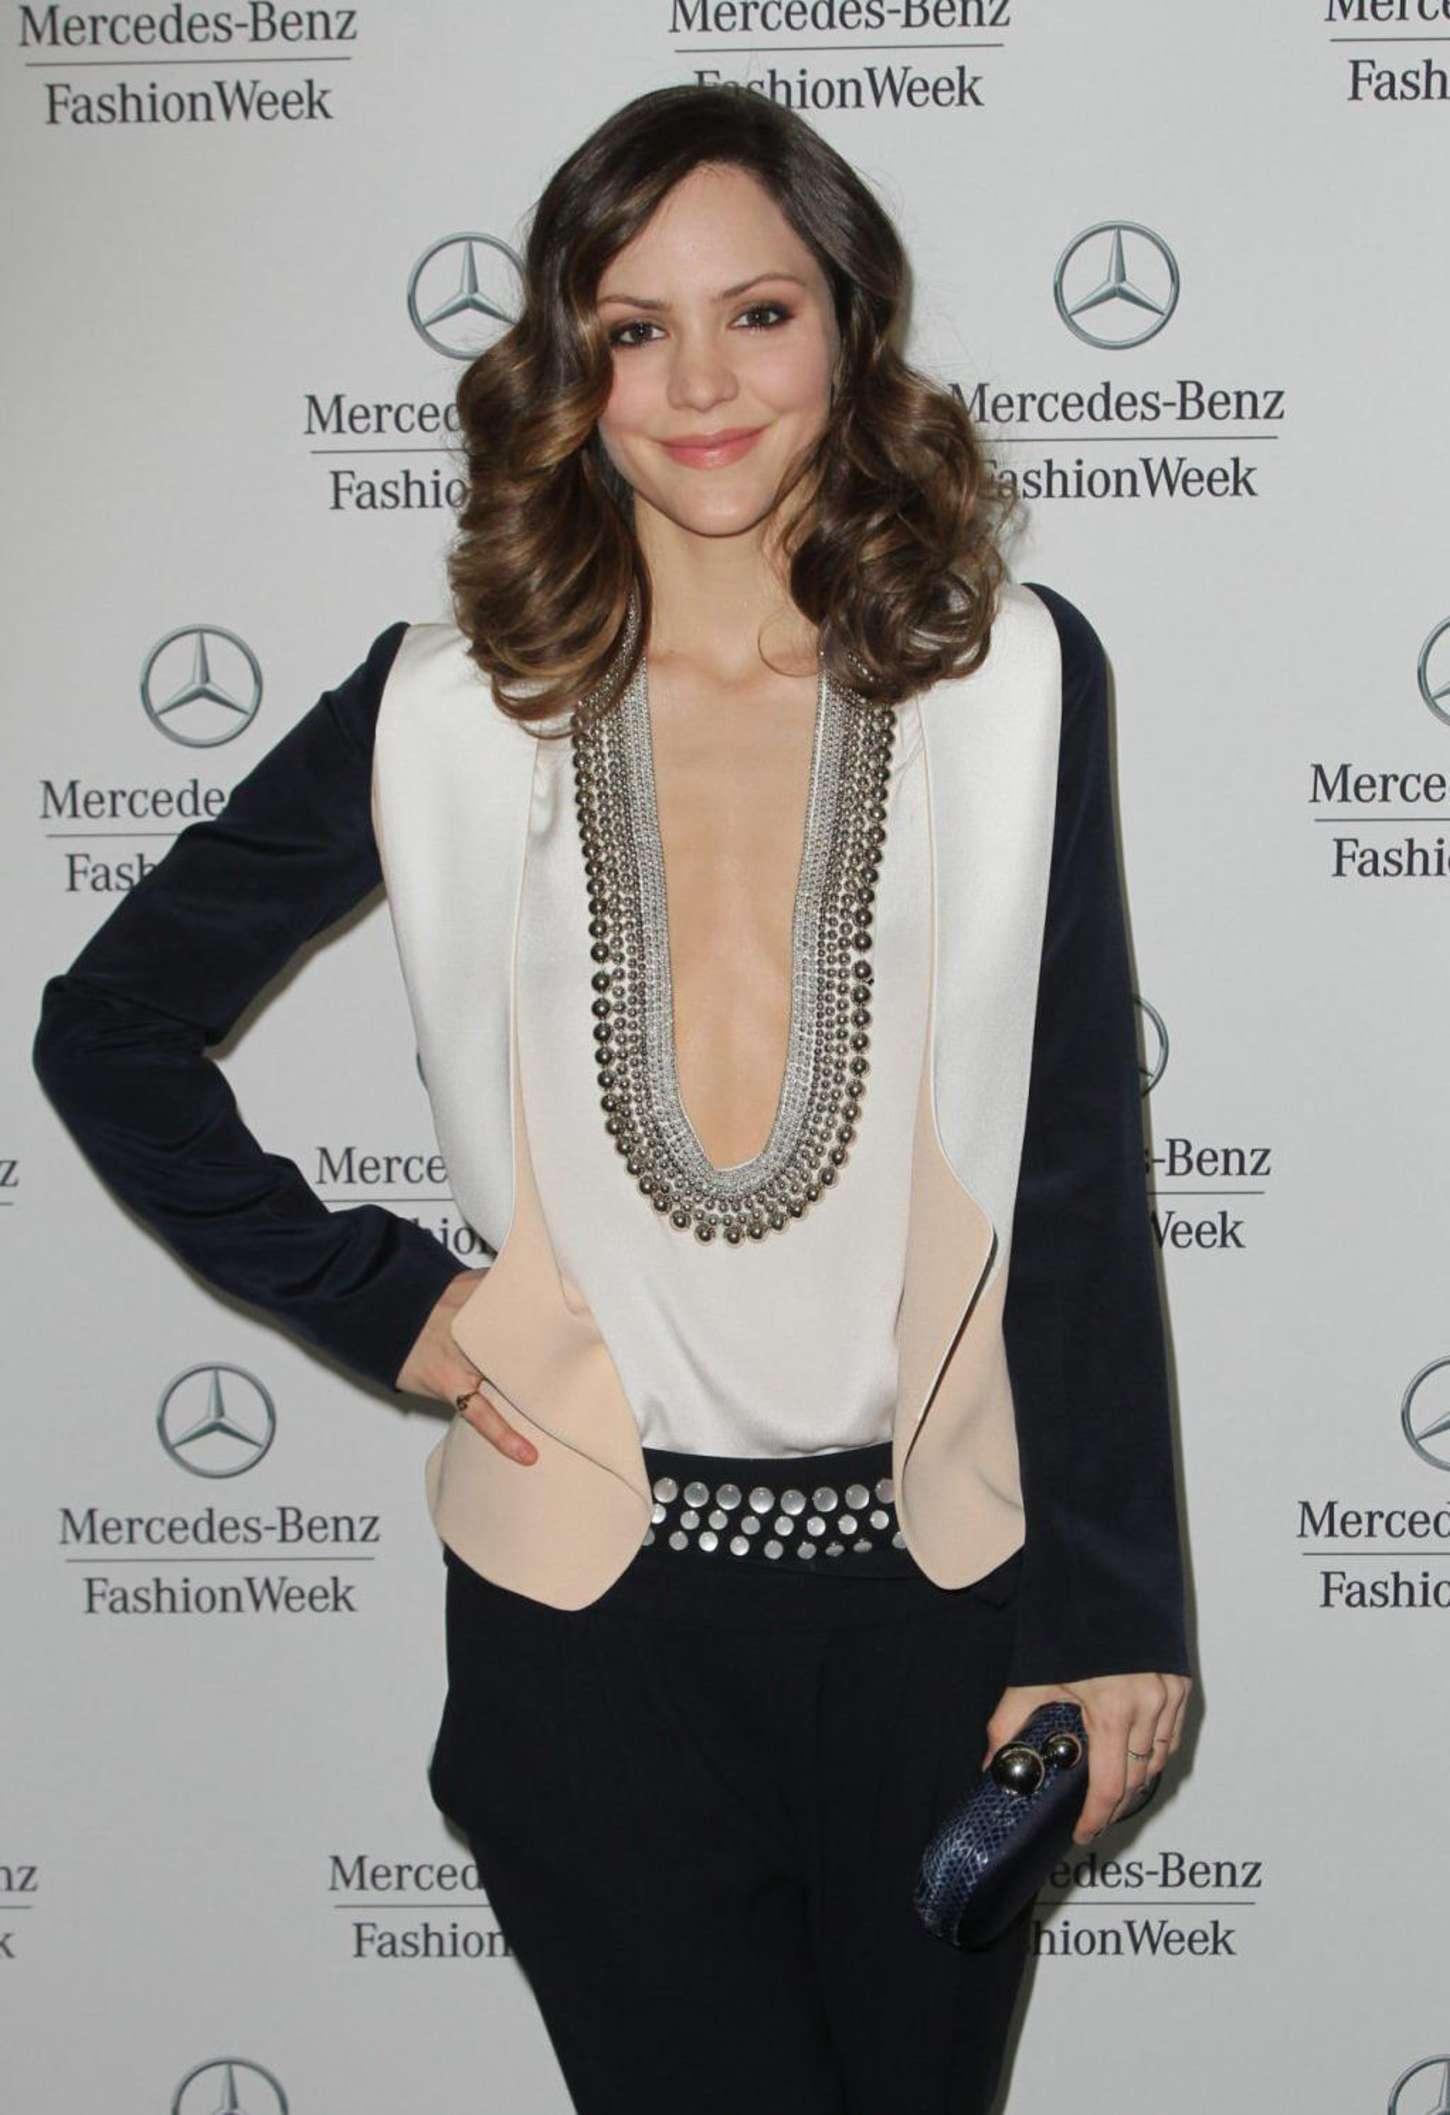 Katharine mcphee 2013 fashion show 14 full size